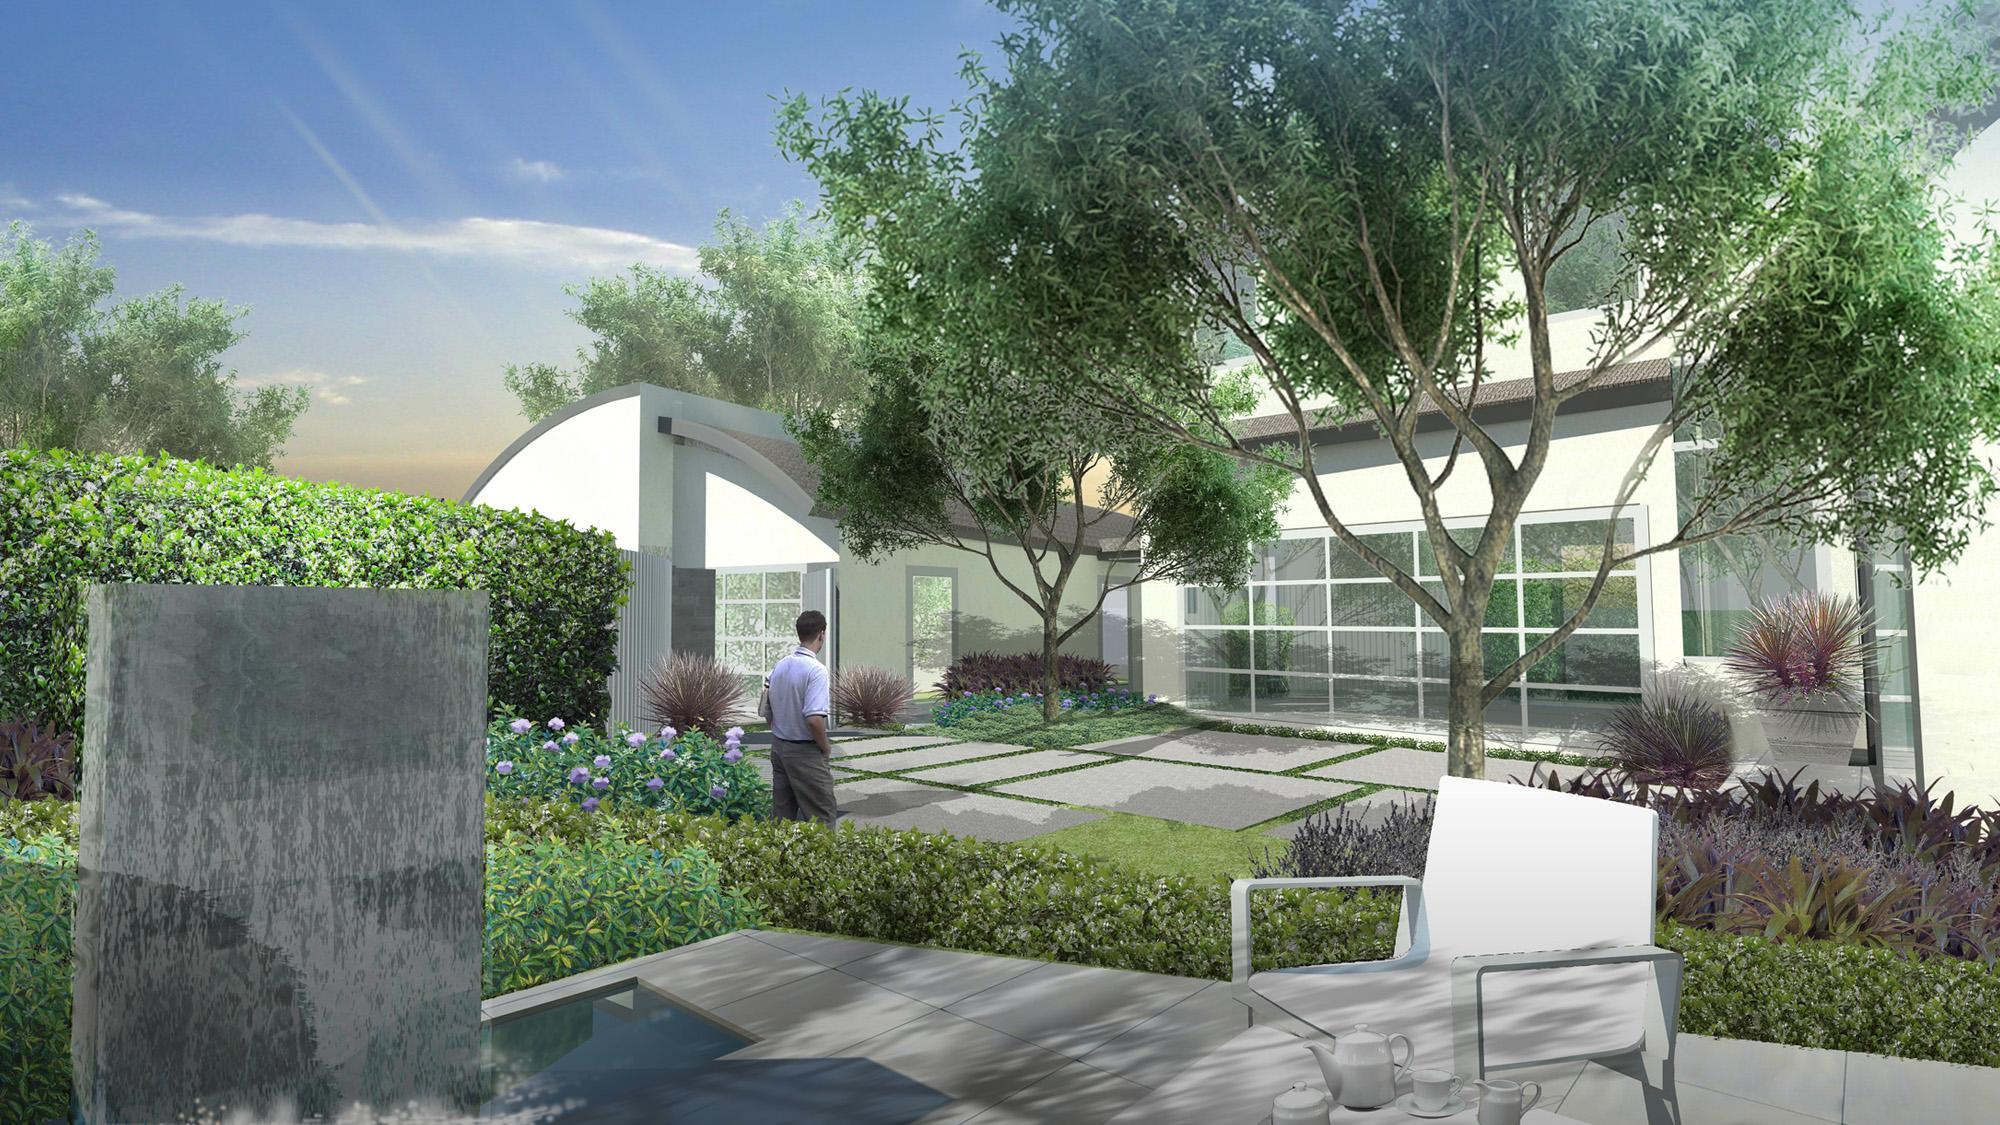 Los Angeles Ca Landscape Architecture Firm Residential Designs Ecocentrix